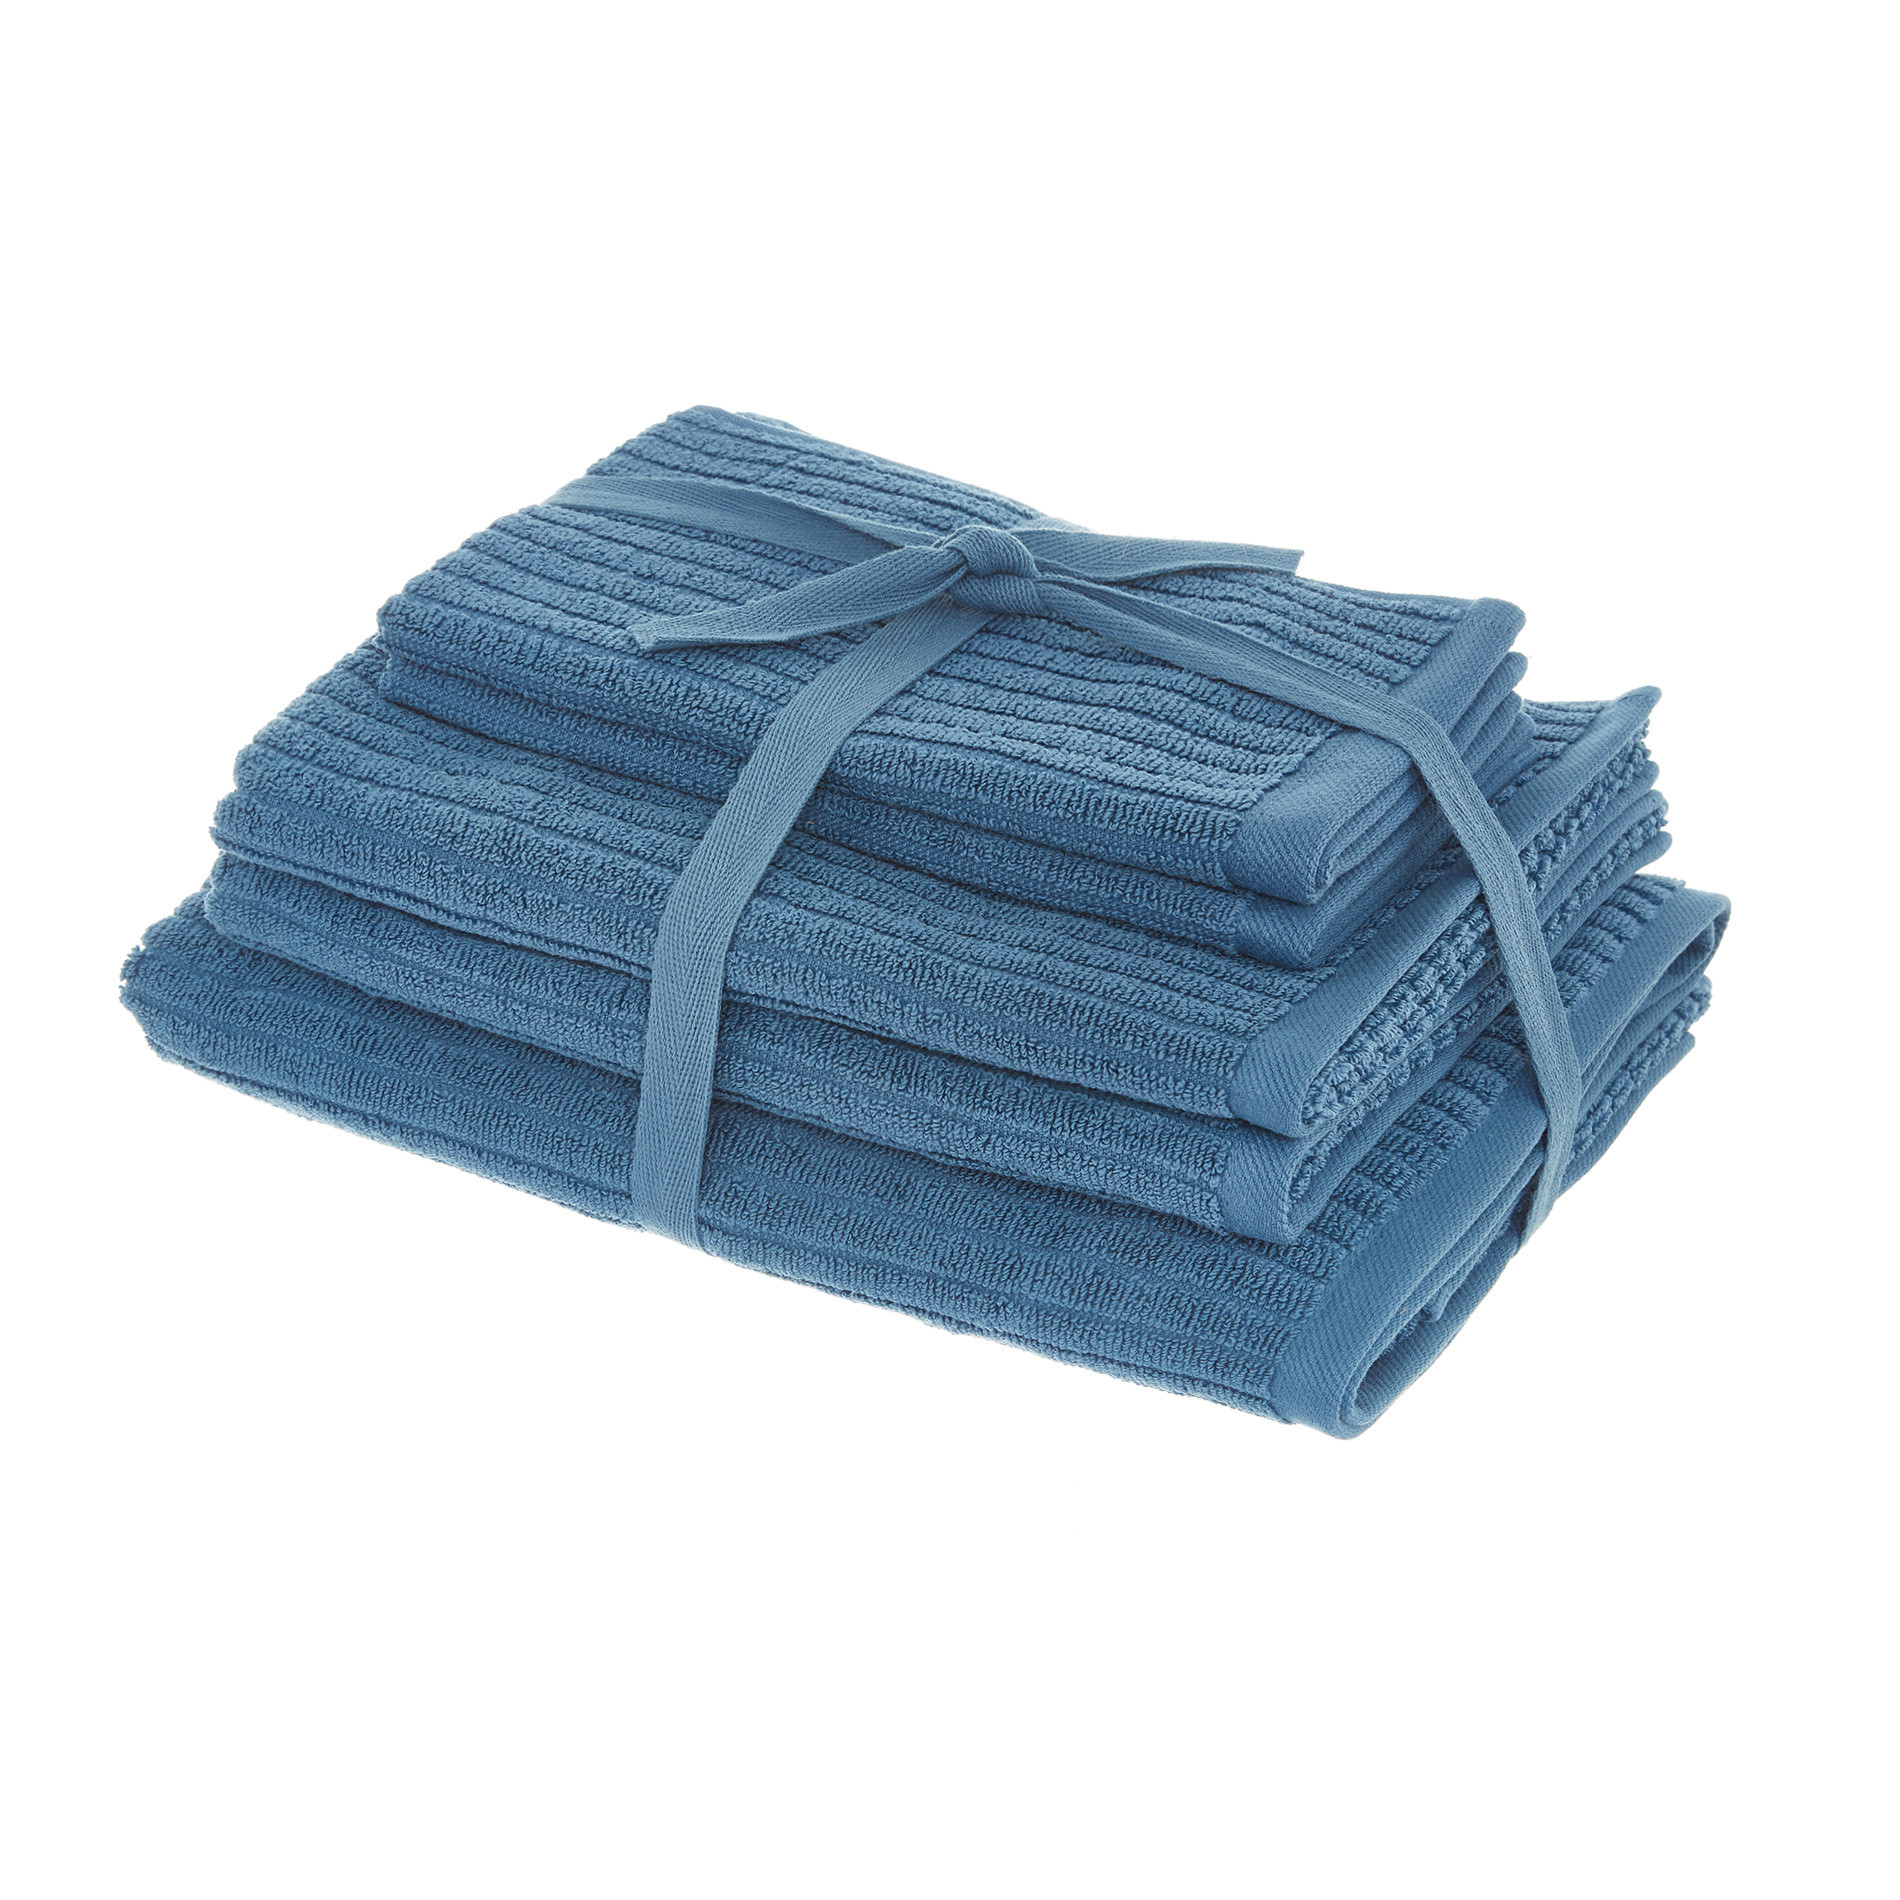 Set asciugamani puro cotone righe jacquard tinta unita, Blu, large image number 0